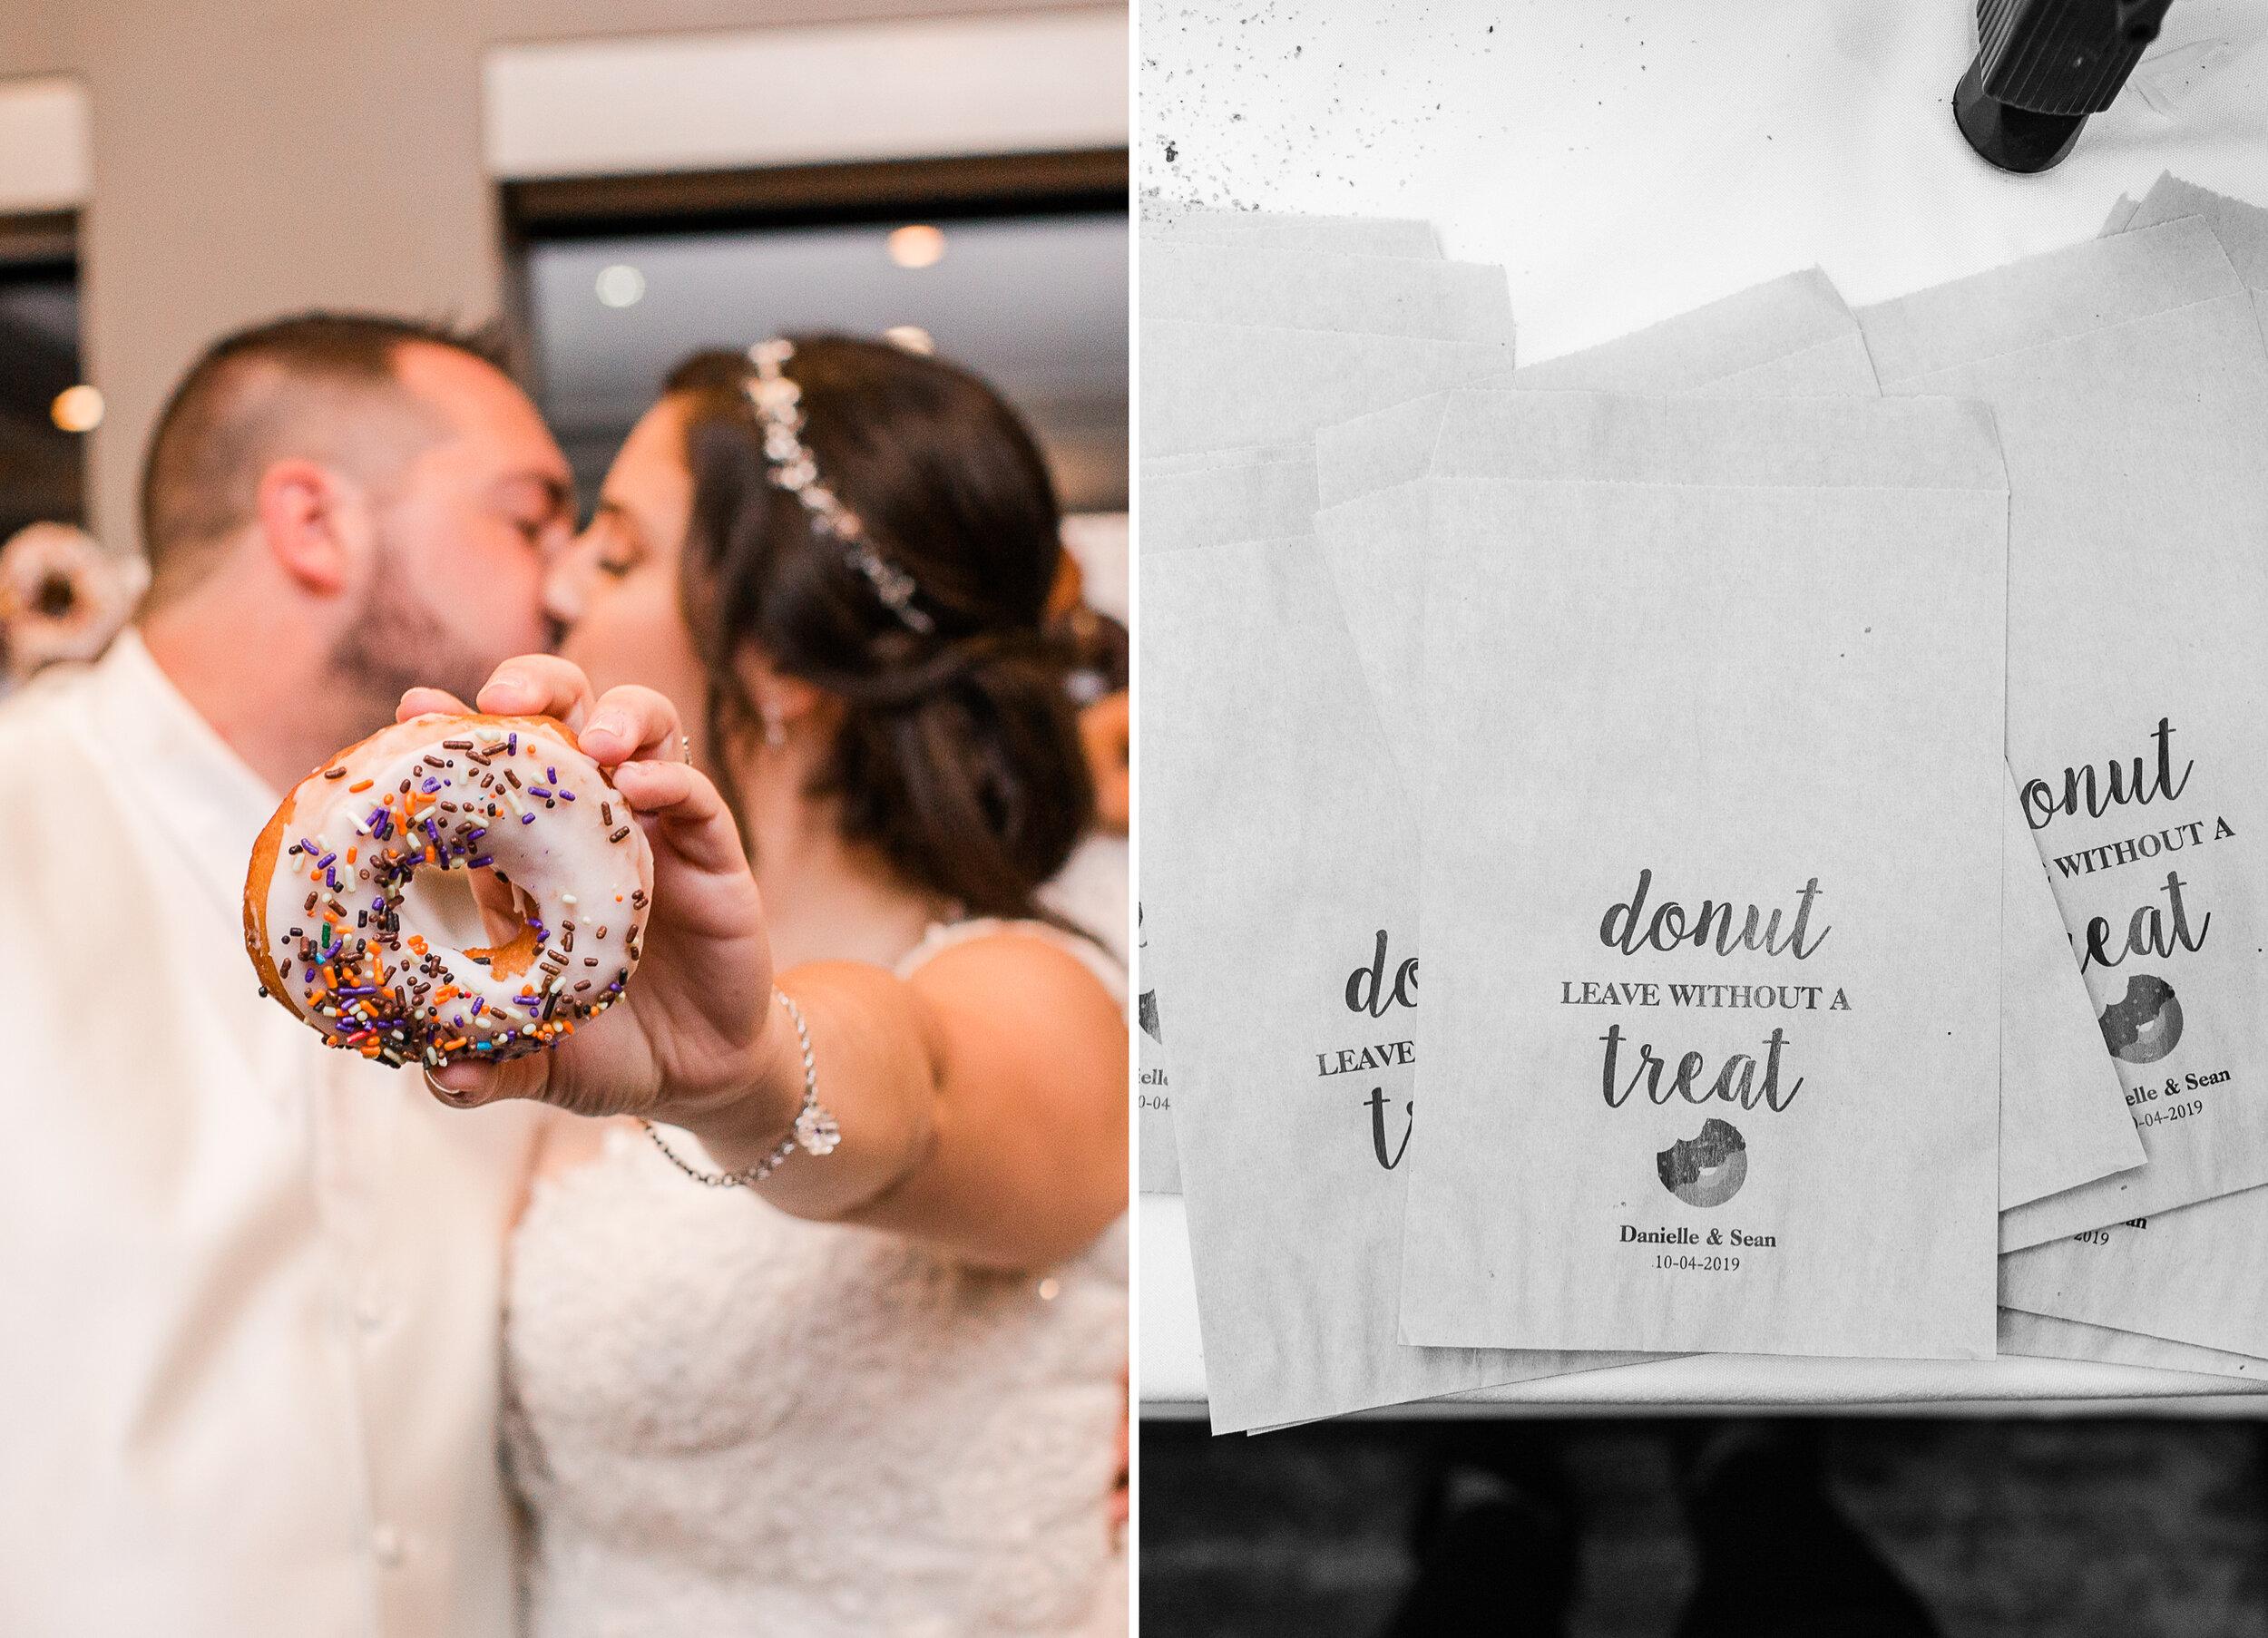 Gotta love donuts instead of wedding cake!!!